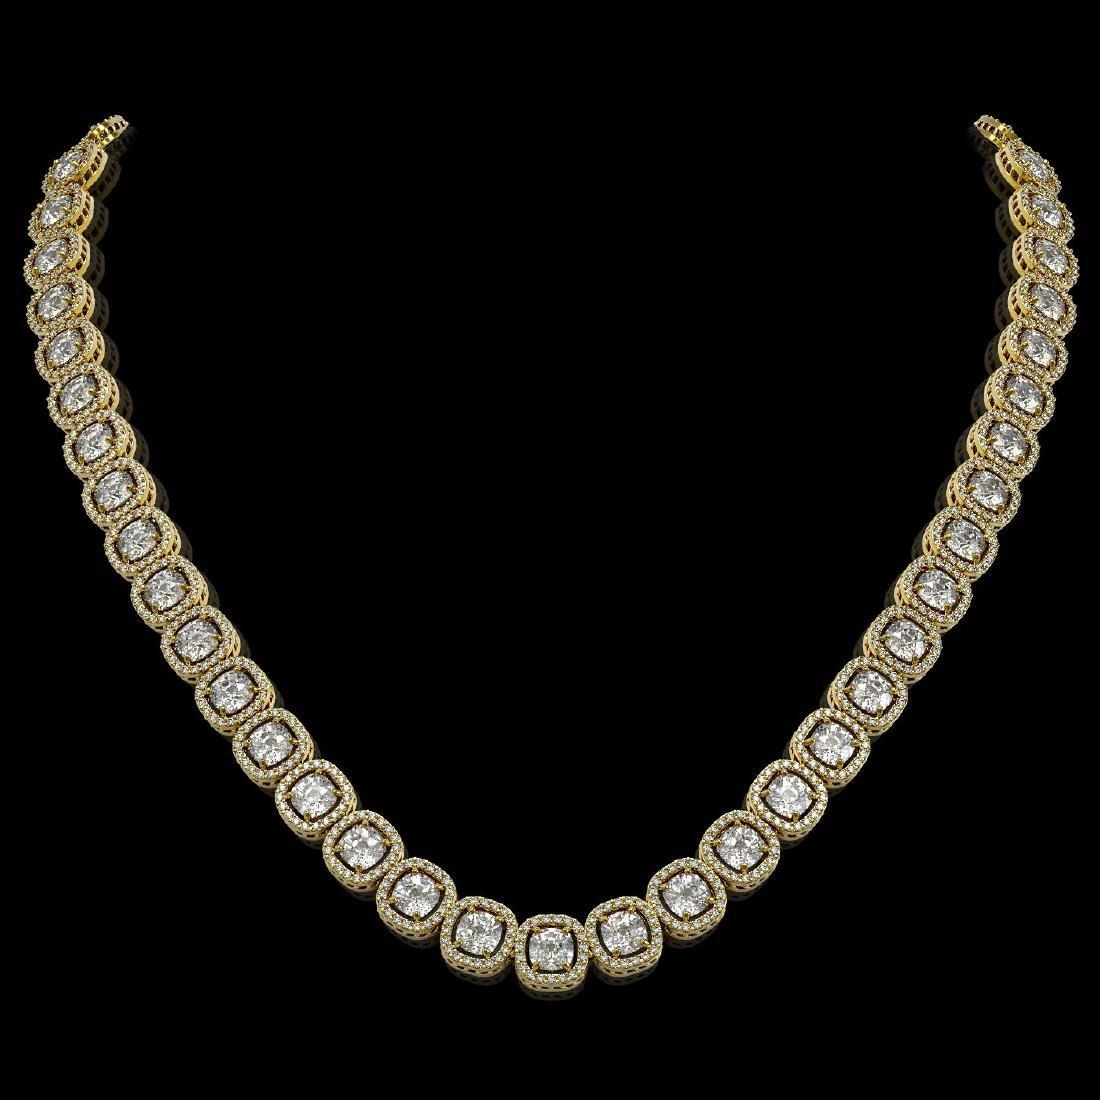 32.64 CTW Cushion Diamond Designer Necklace 18K Yellow